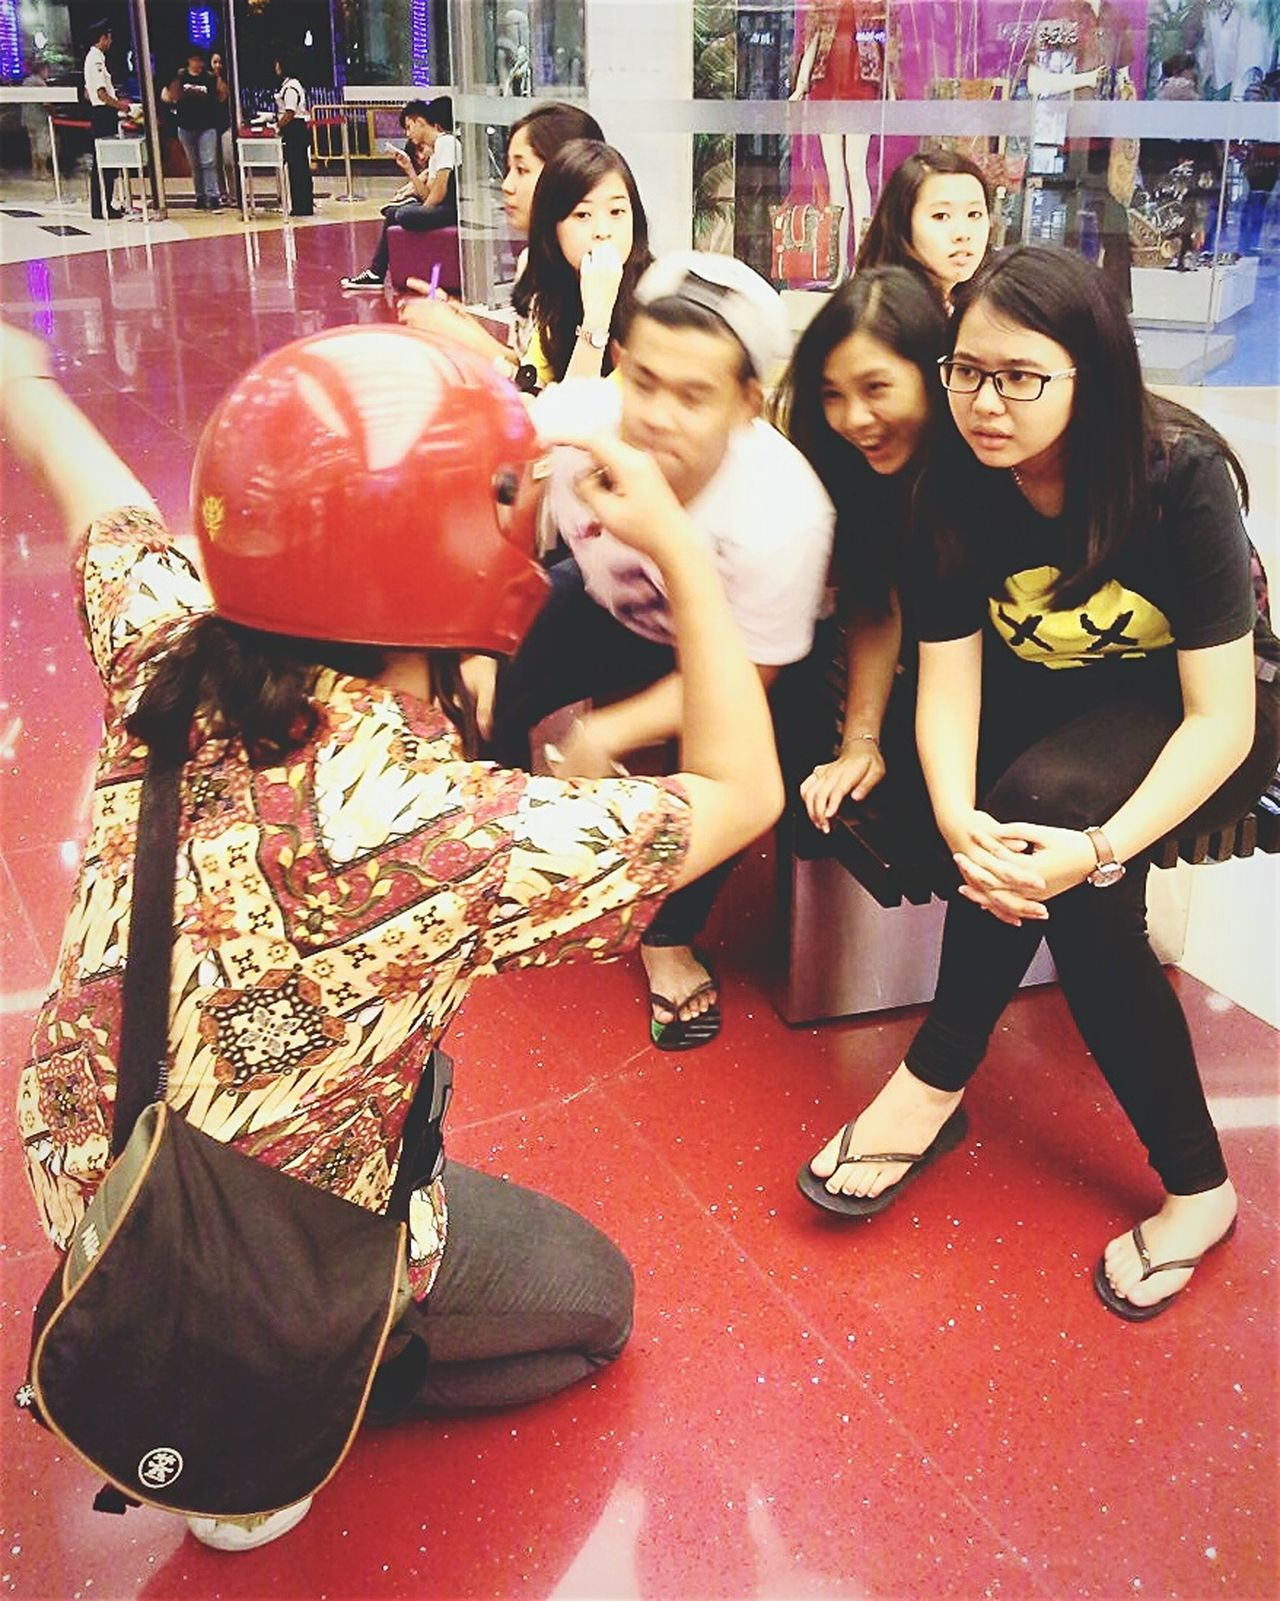 ...me teaching hahaha RePicture Friendship Students Lecture Simpson Helmet BatikIndonesia Batik Red Quality Time EyeEm Indonesia